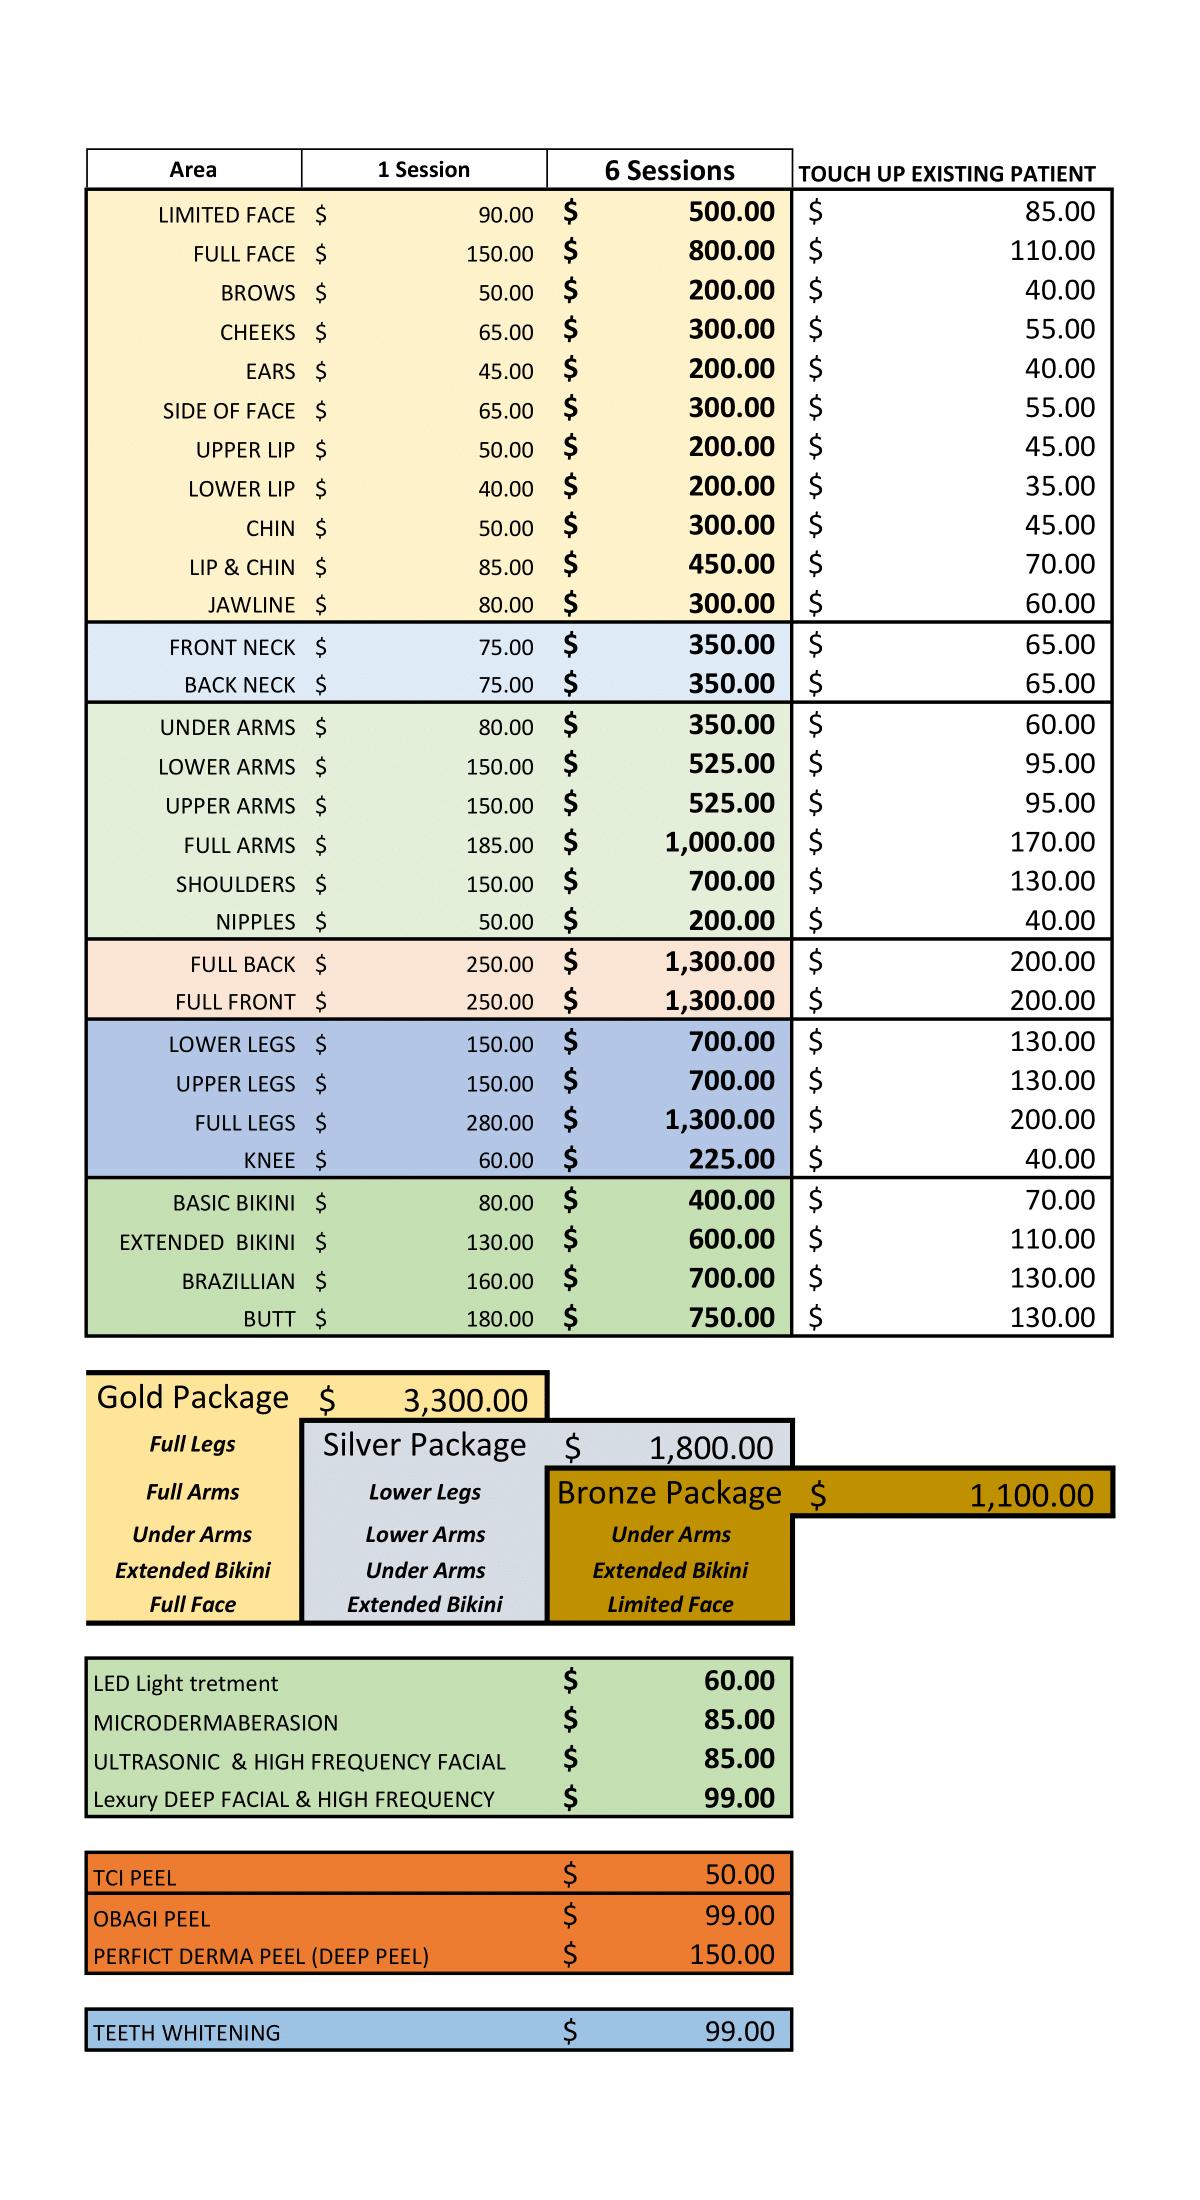 SSLC PRICE LIST IIII.xlsx - Sheet2-1